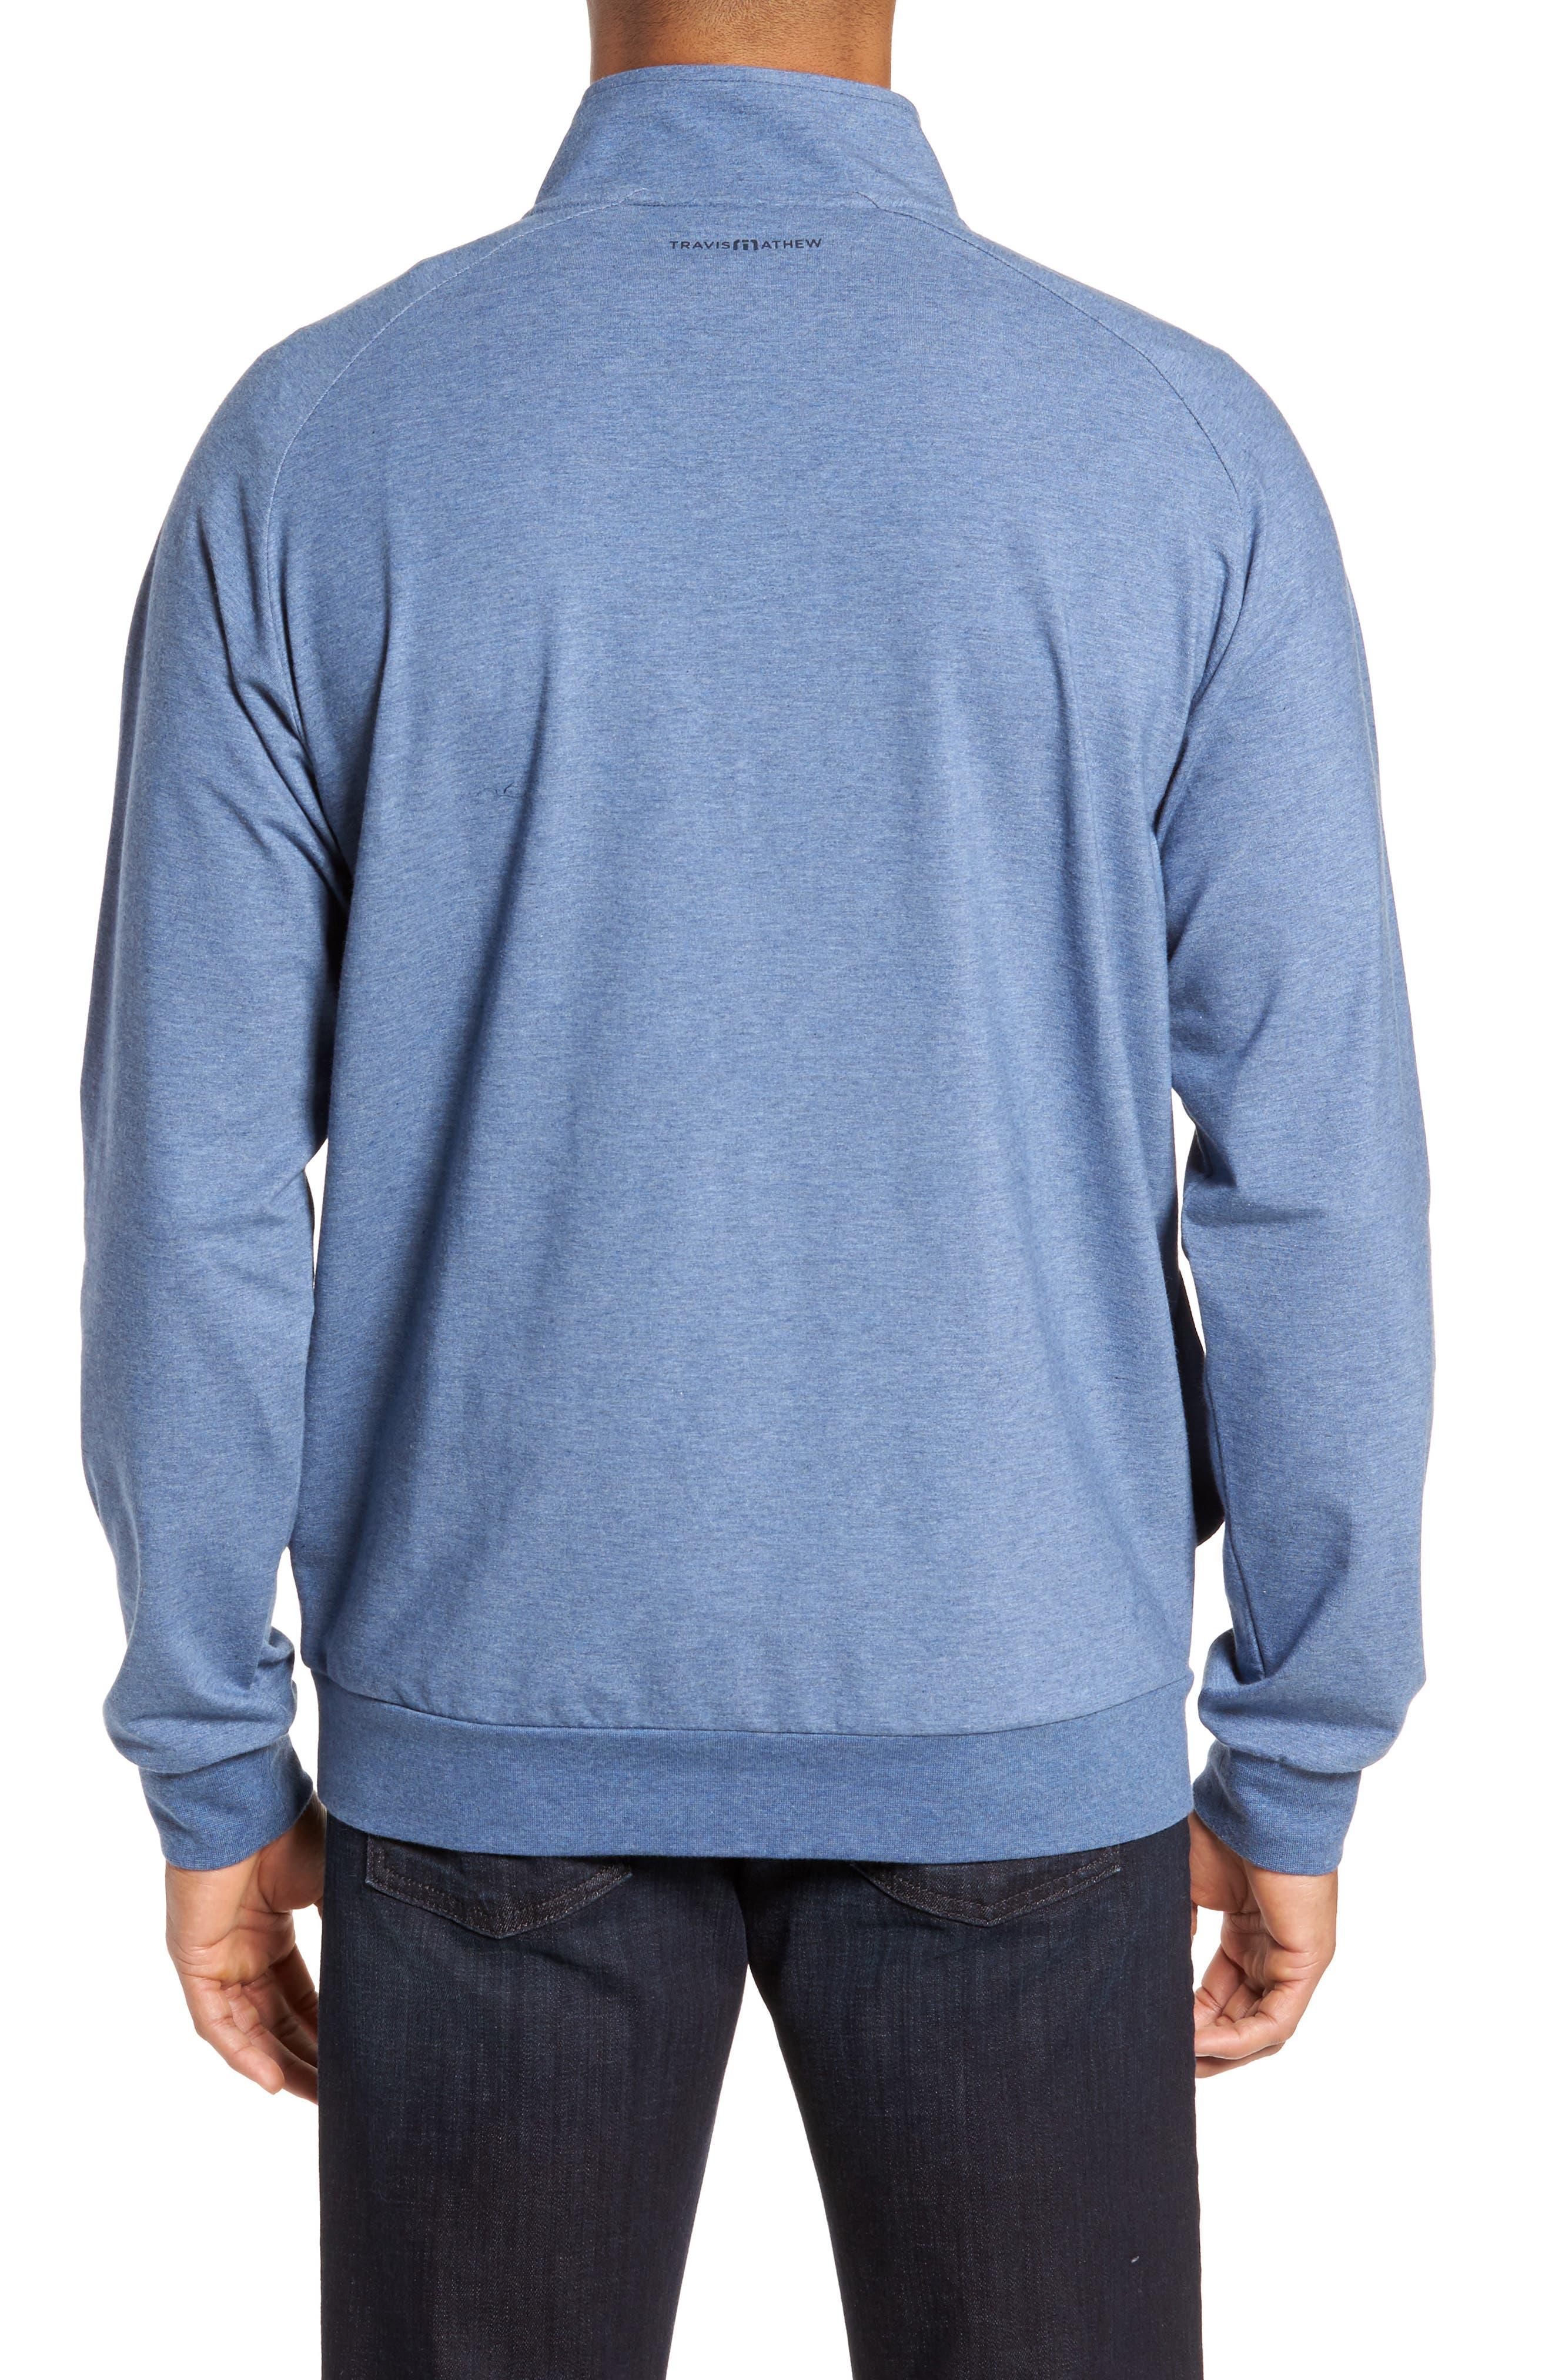 Alternate Image 2  - Travis Mathew 'Strange Love' Trim Fit Wrinkle Resistant Quarter Zip Jacket